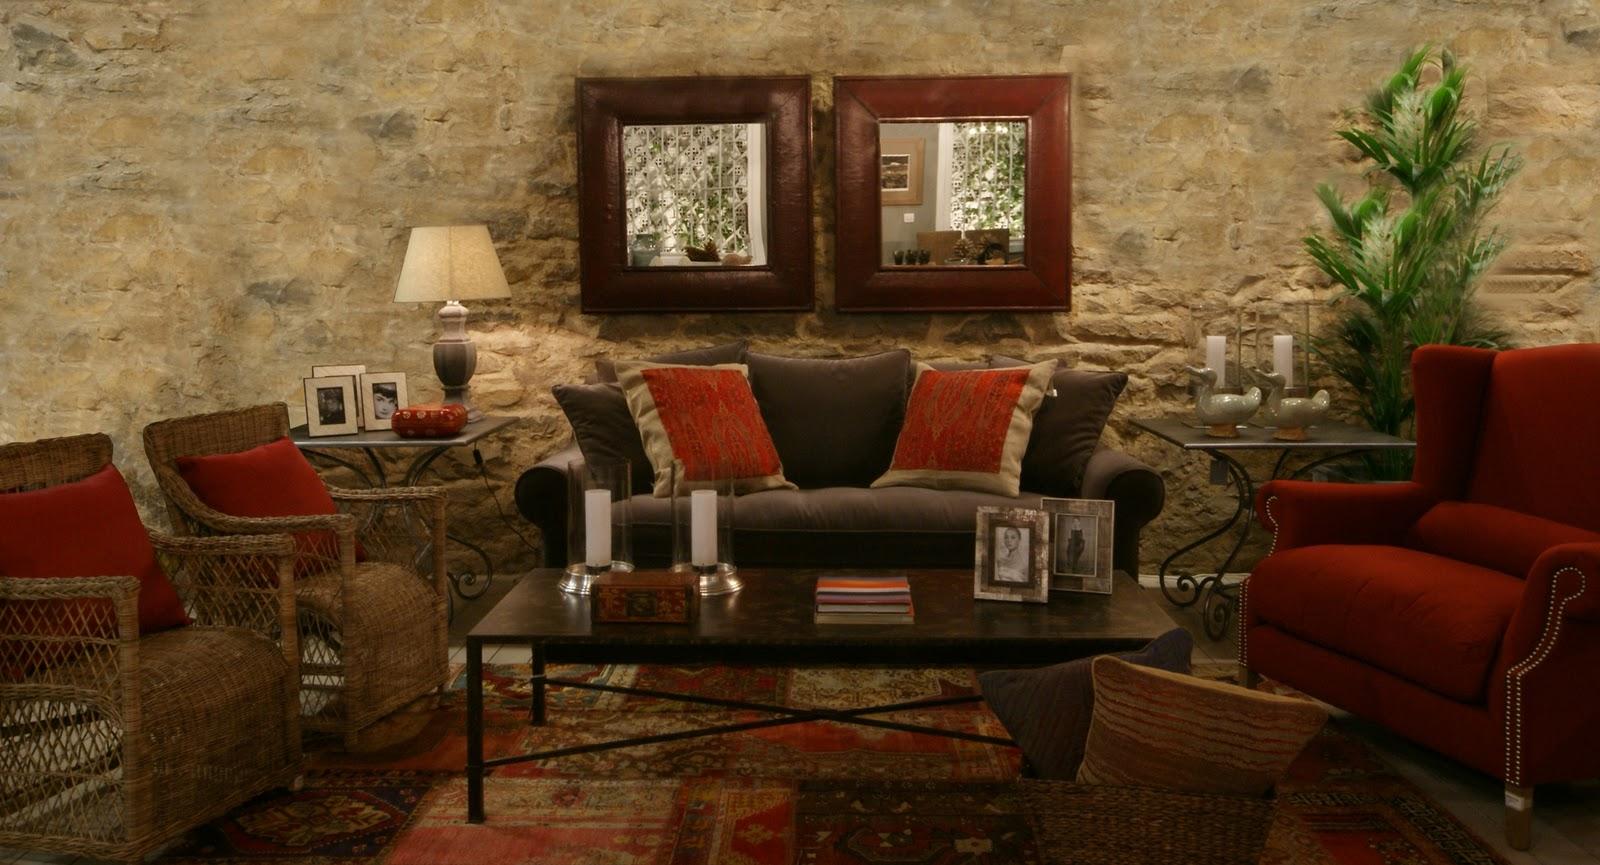 - Becara catalogo muebles ...